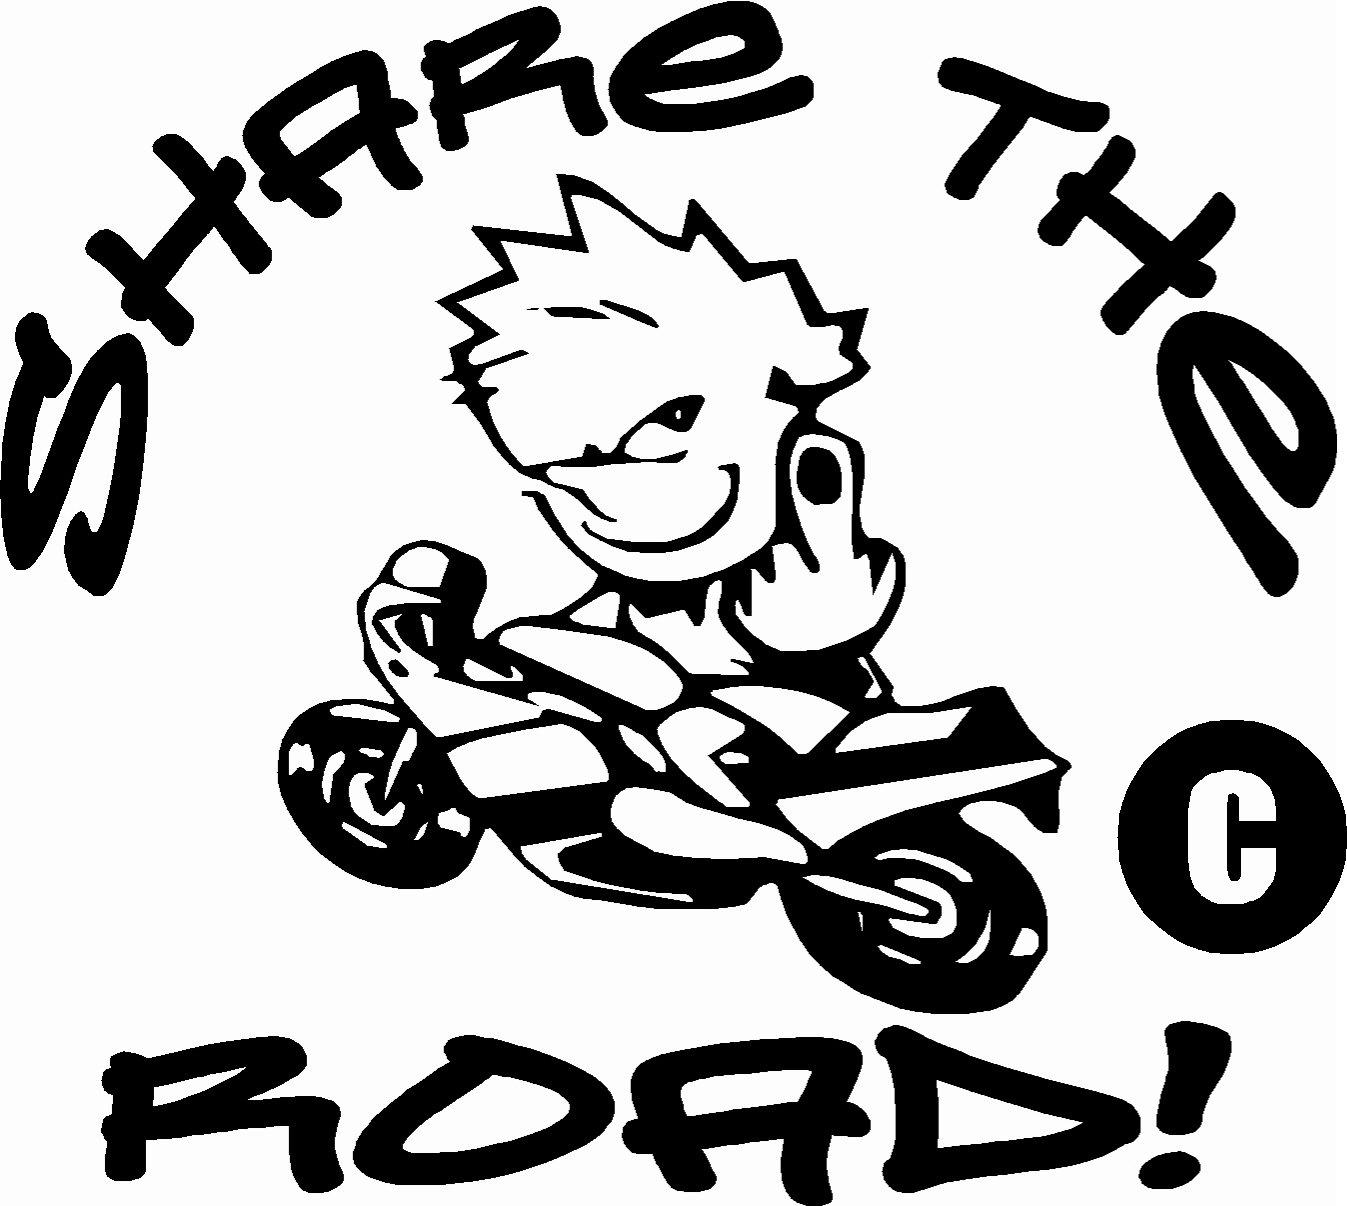 calvin on motorcycle scooter bike share the road giving finger vinyl sticker